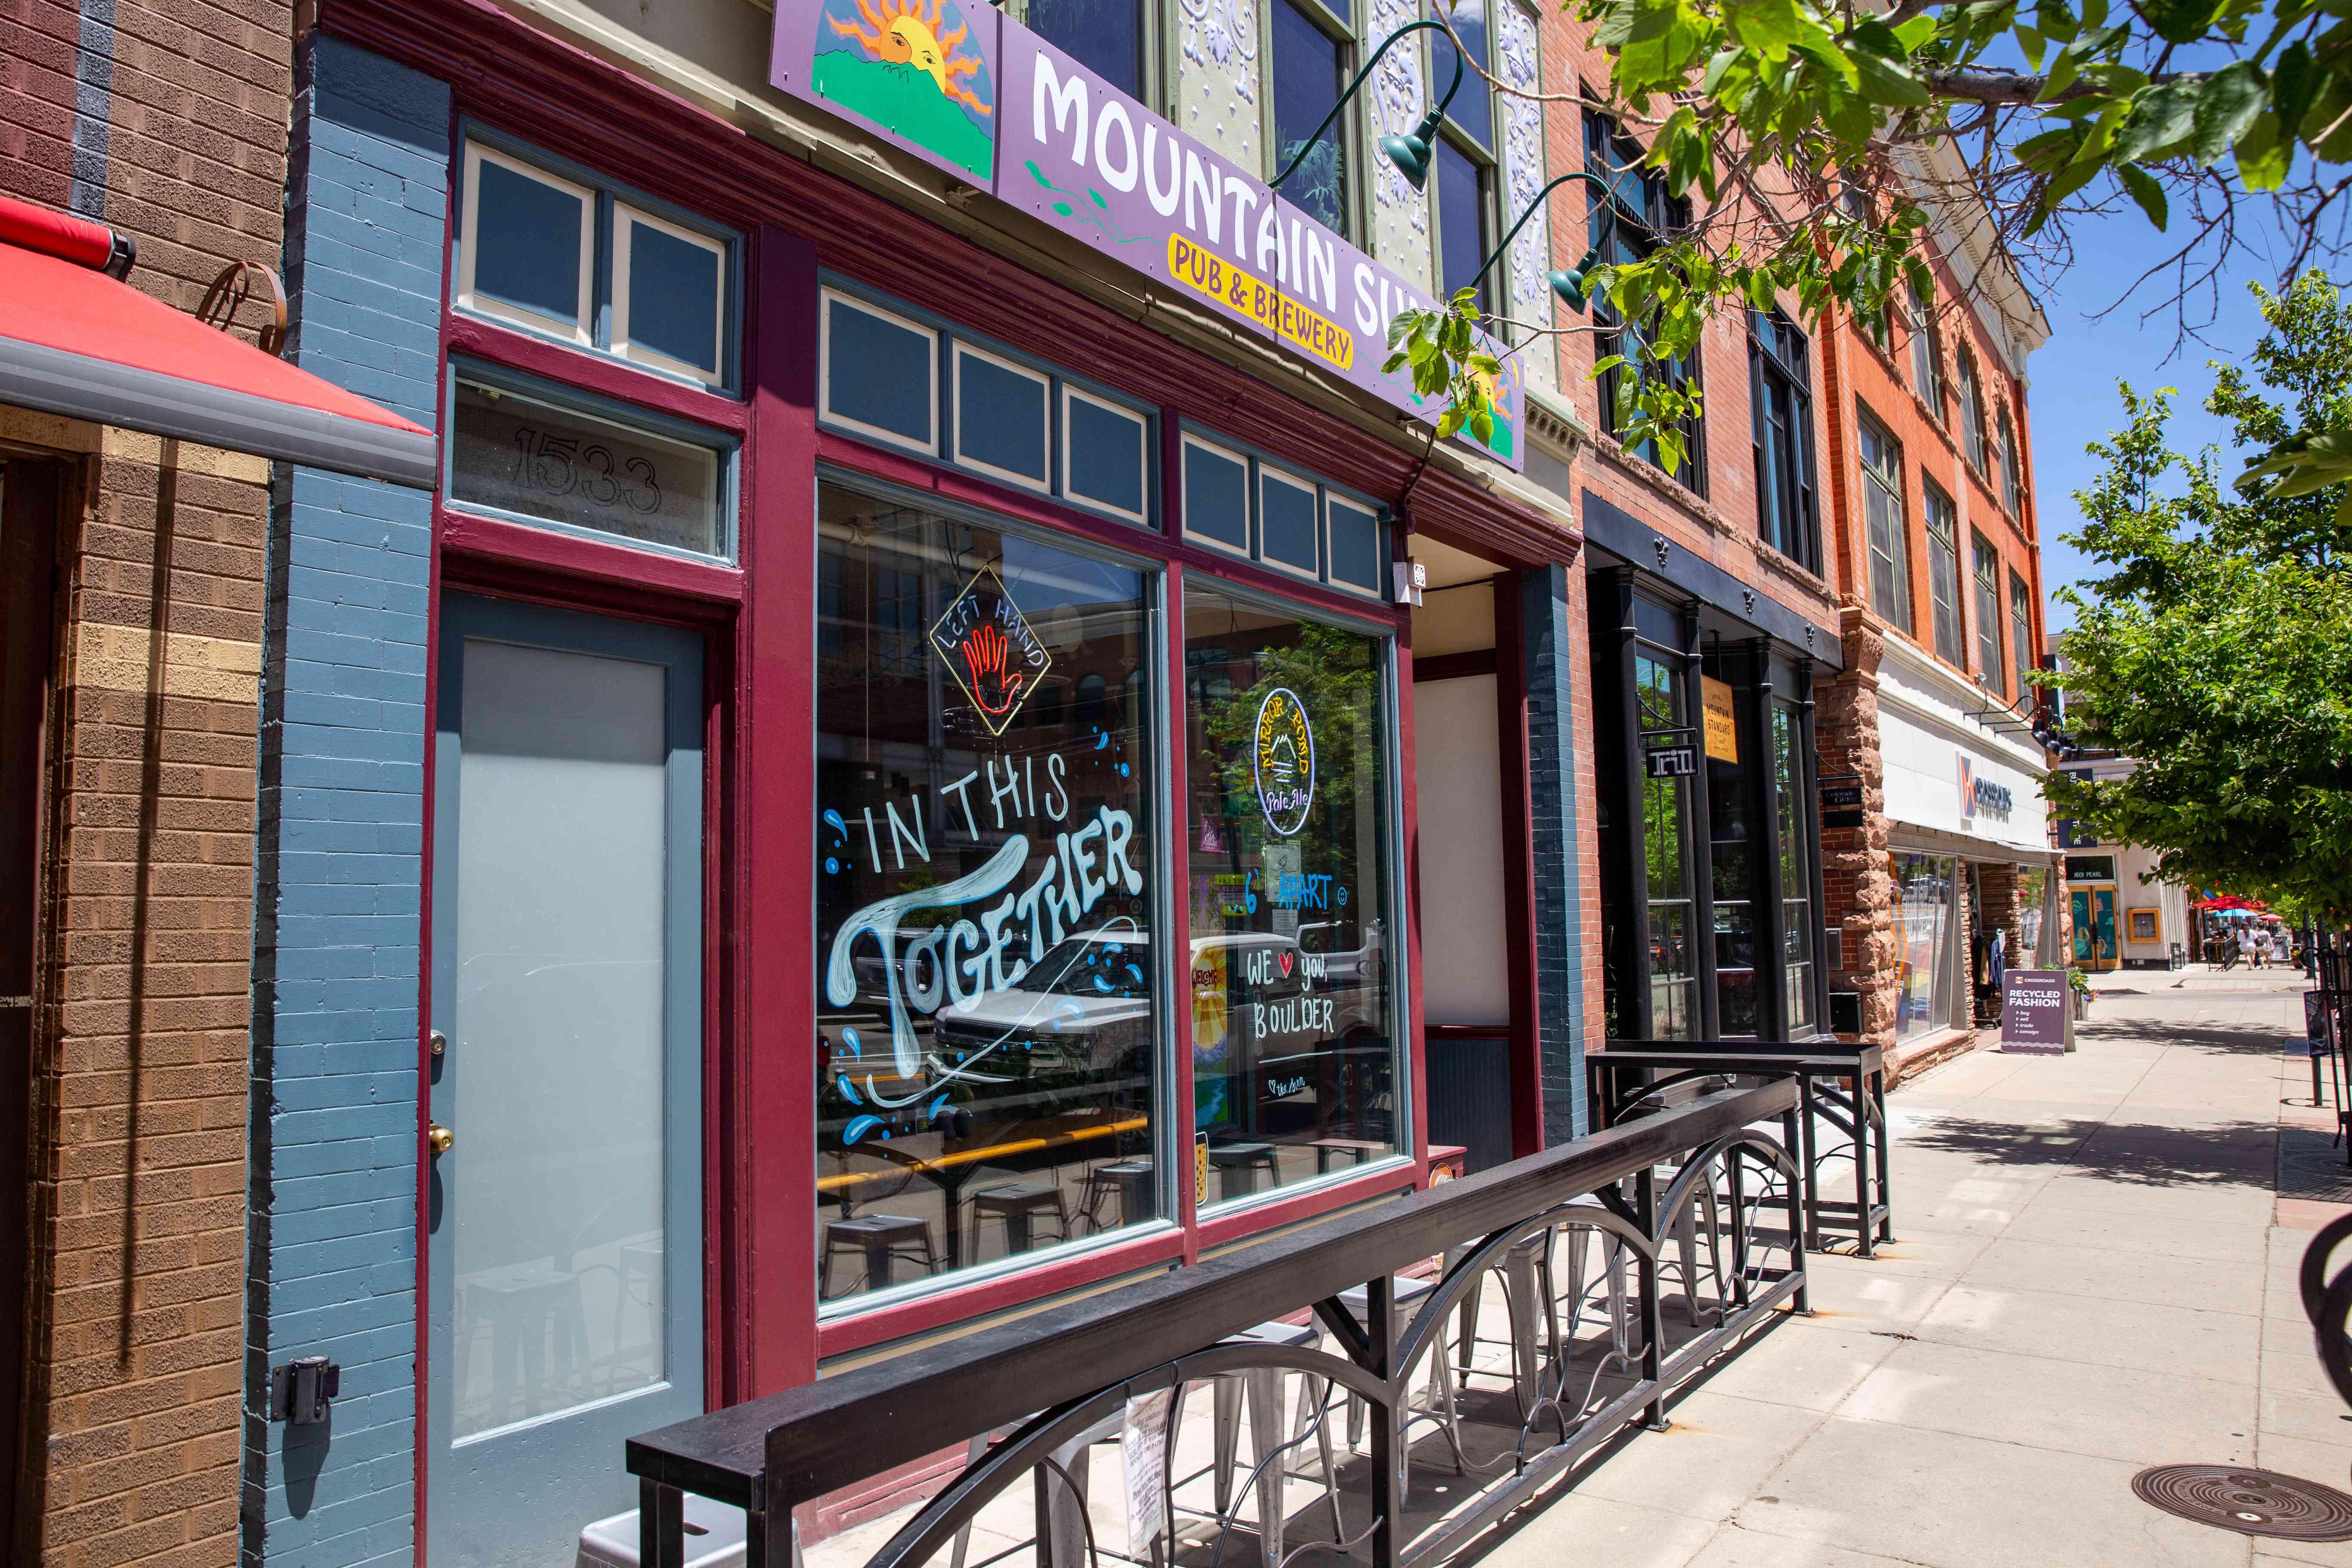 Mountain Sun Pub and Brewery in Colorado